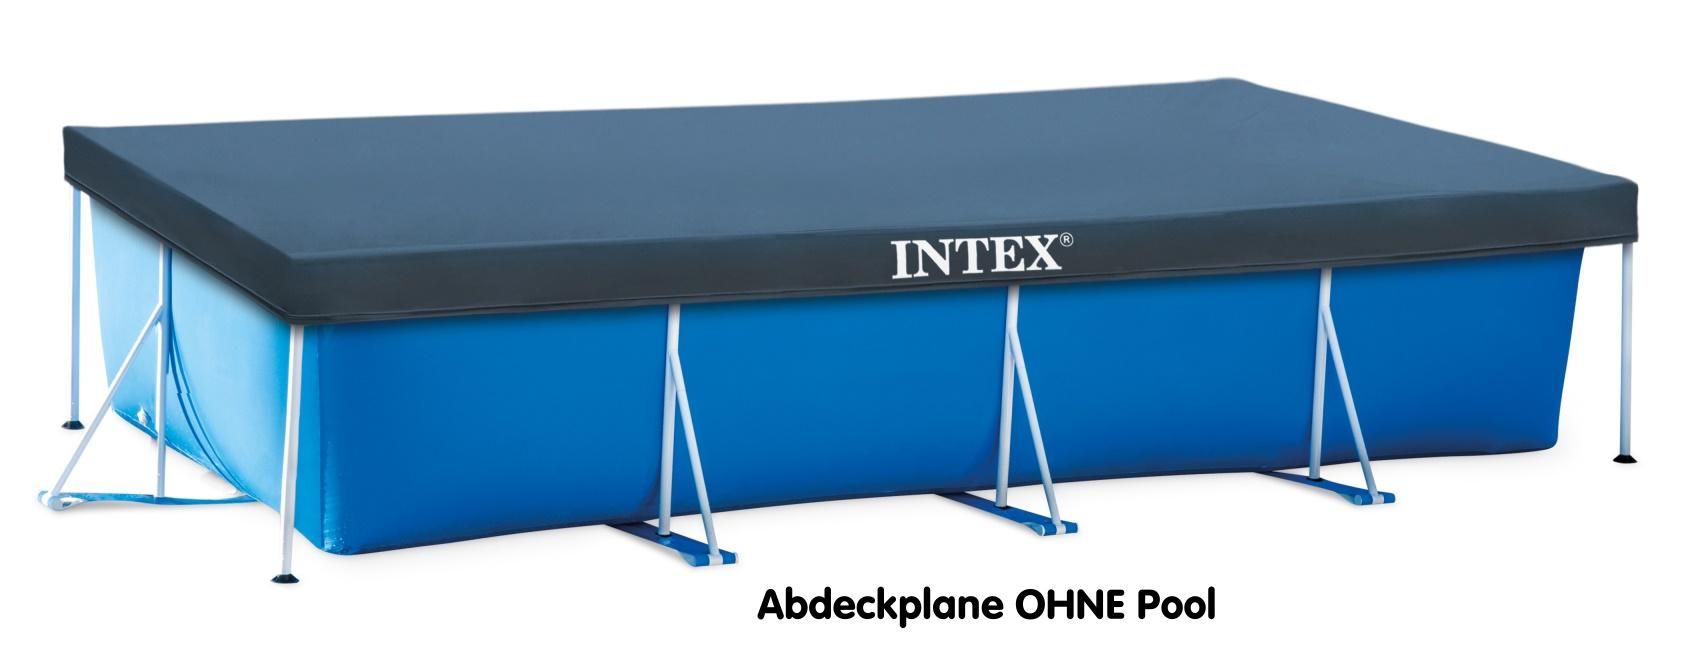 intex abdeckplane rechteckig 450x220cm 28039 zubeh r pools. Black Bedroom Furniture Sets. Home Design Ideas